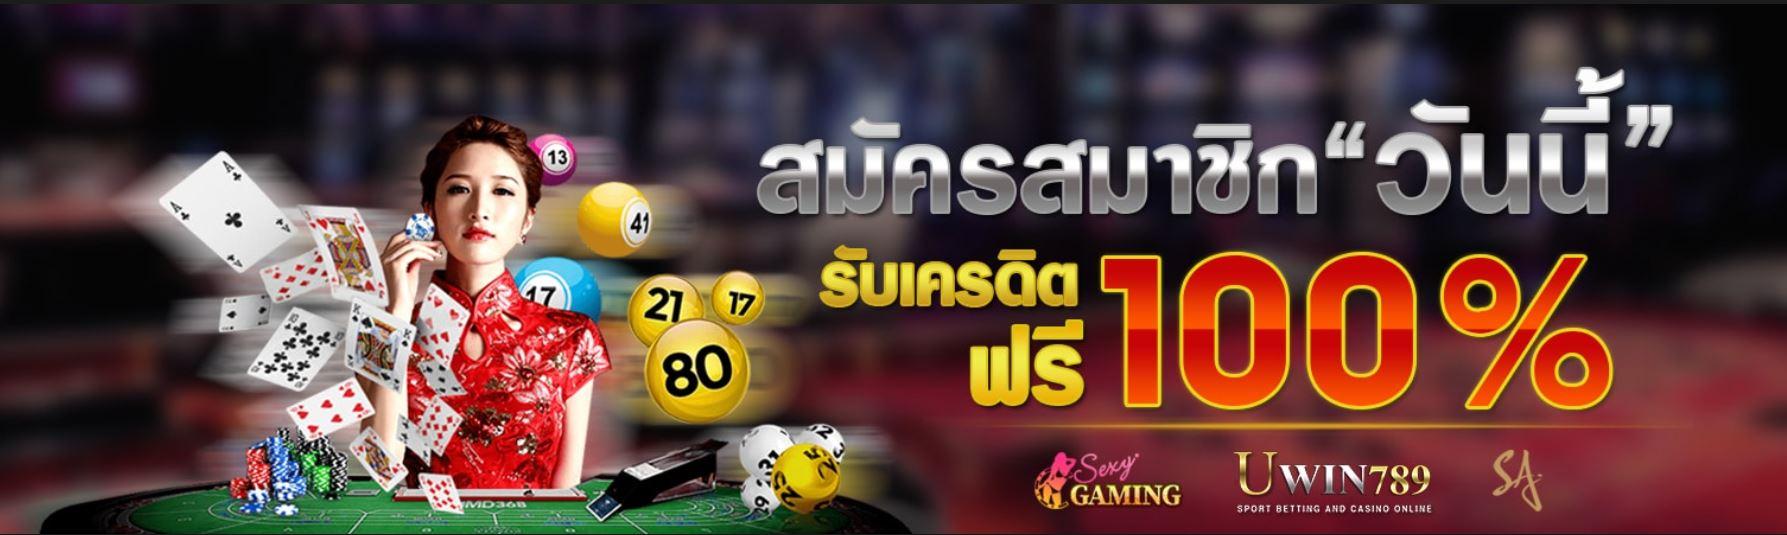 uwin789-casino-online